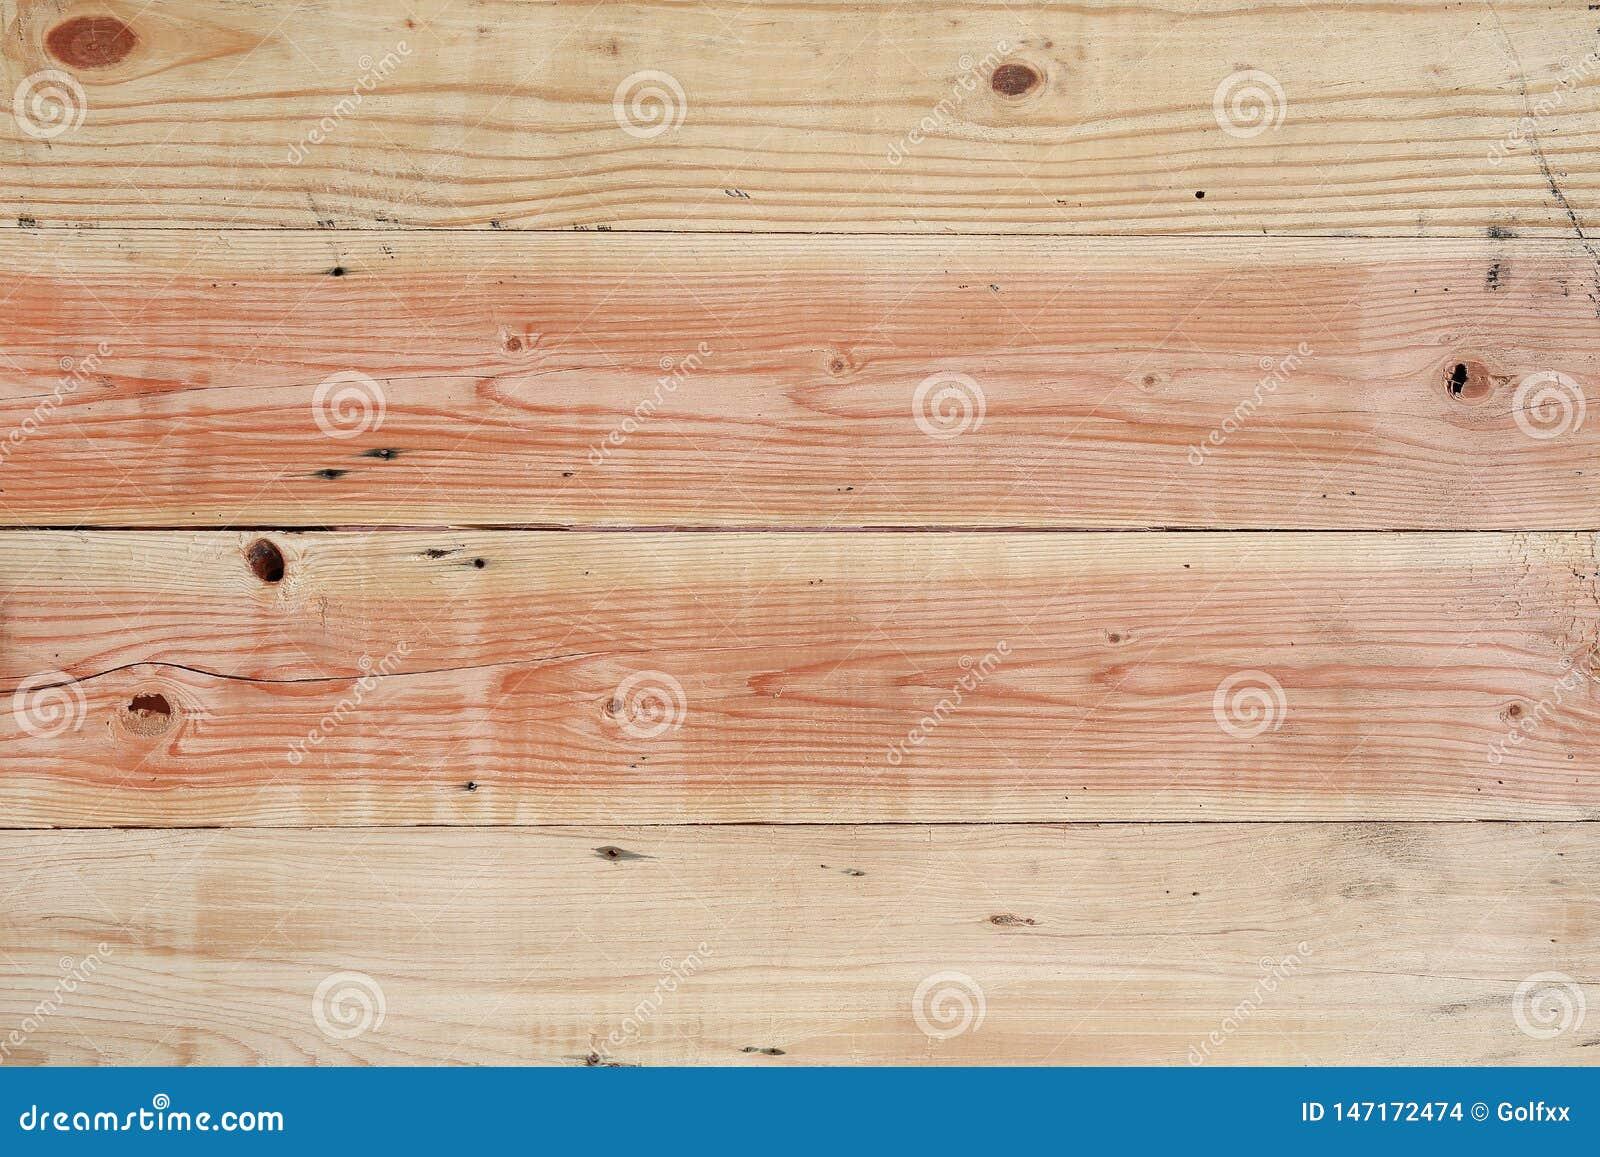 Wood plank wall horizontal background